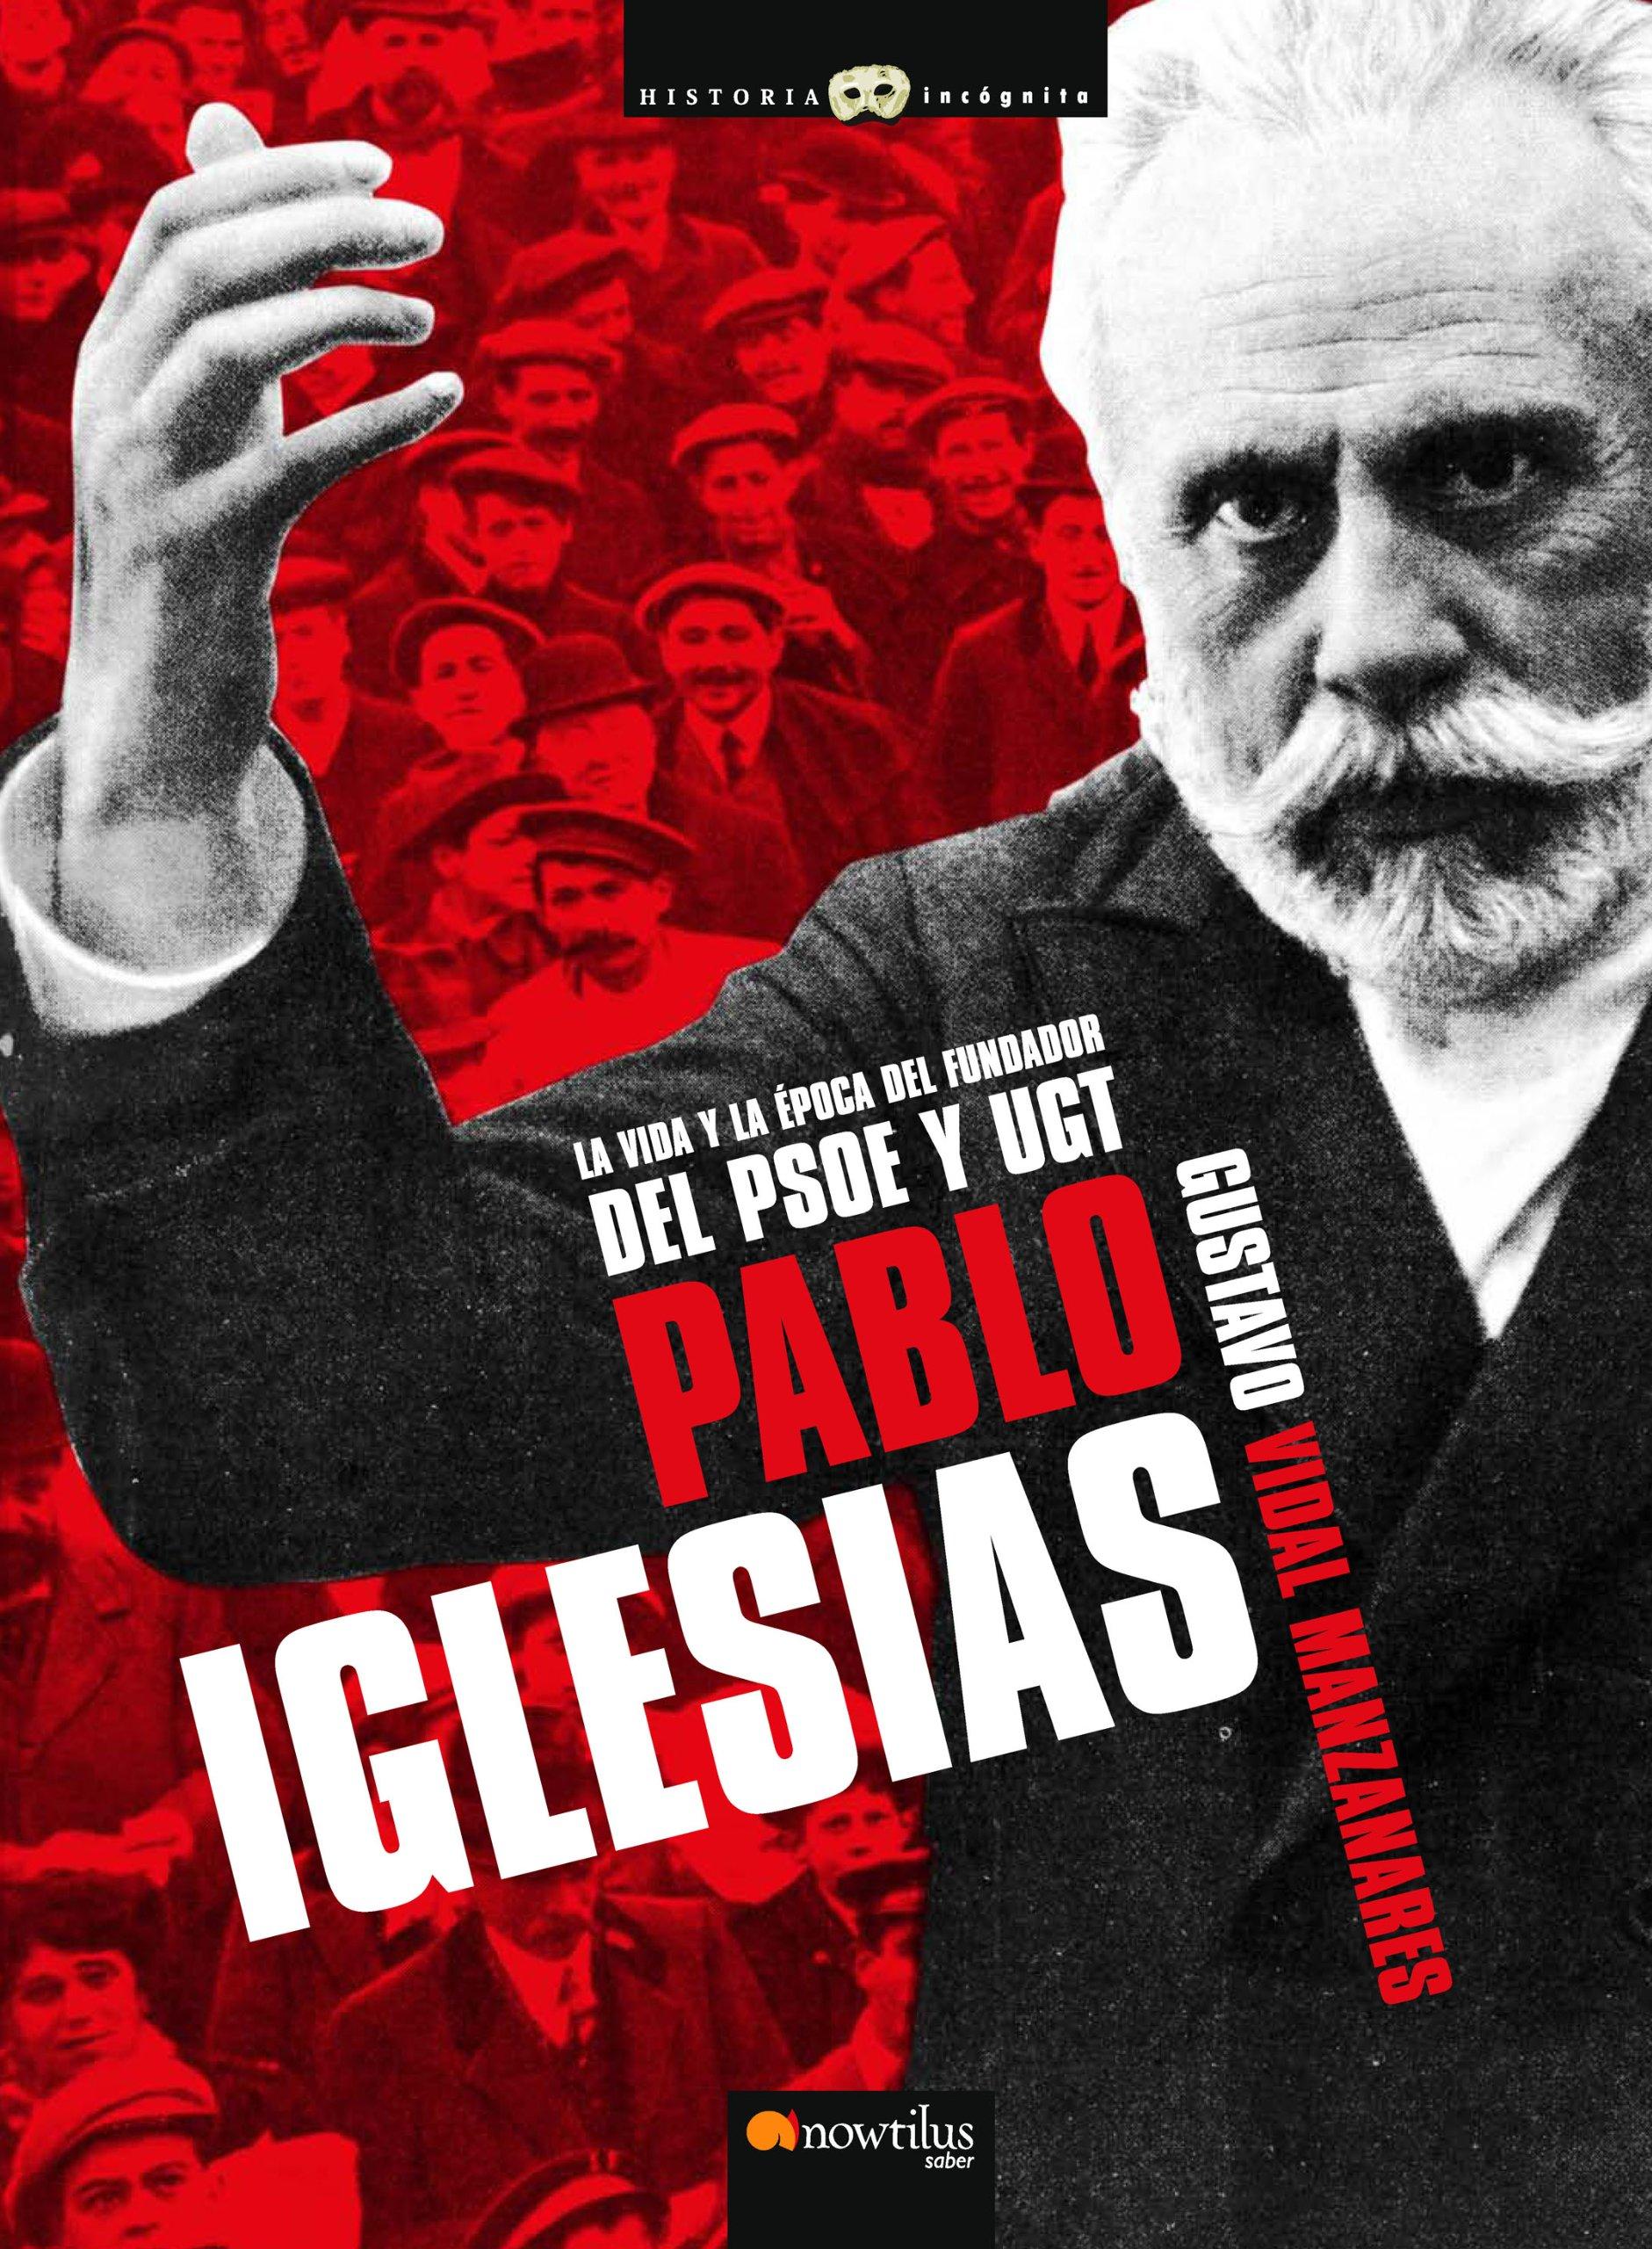 Pablo Iglesias (Historia incognita/Unknown History) (Spanish Edition) (Spanish) Paperback – April 1, 2009